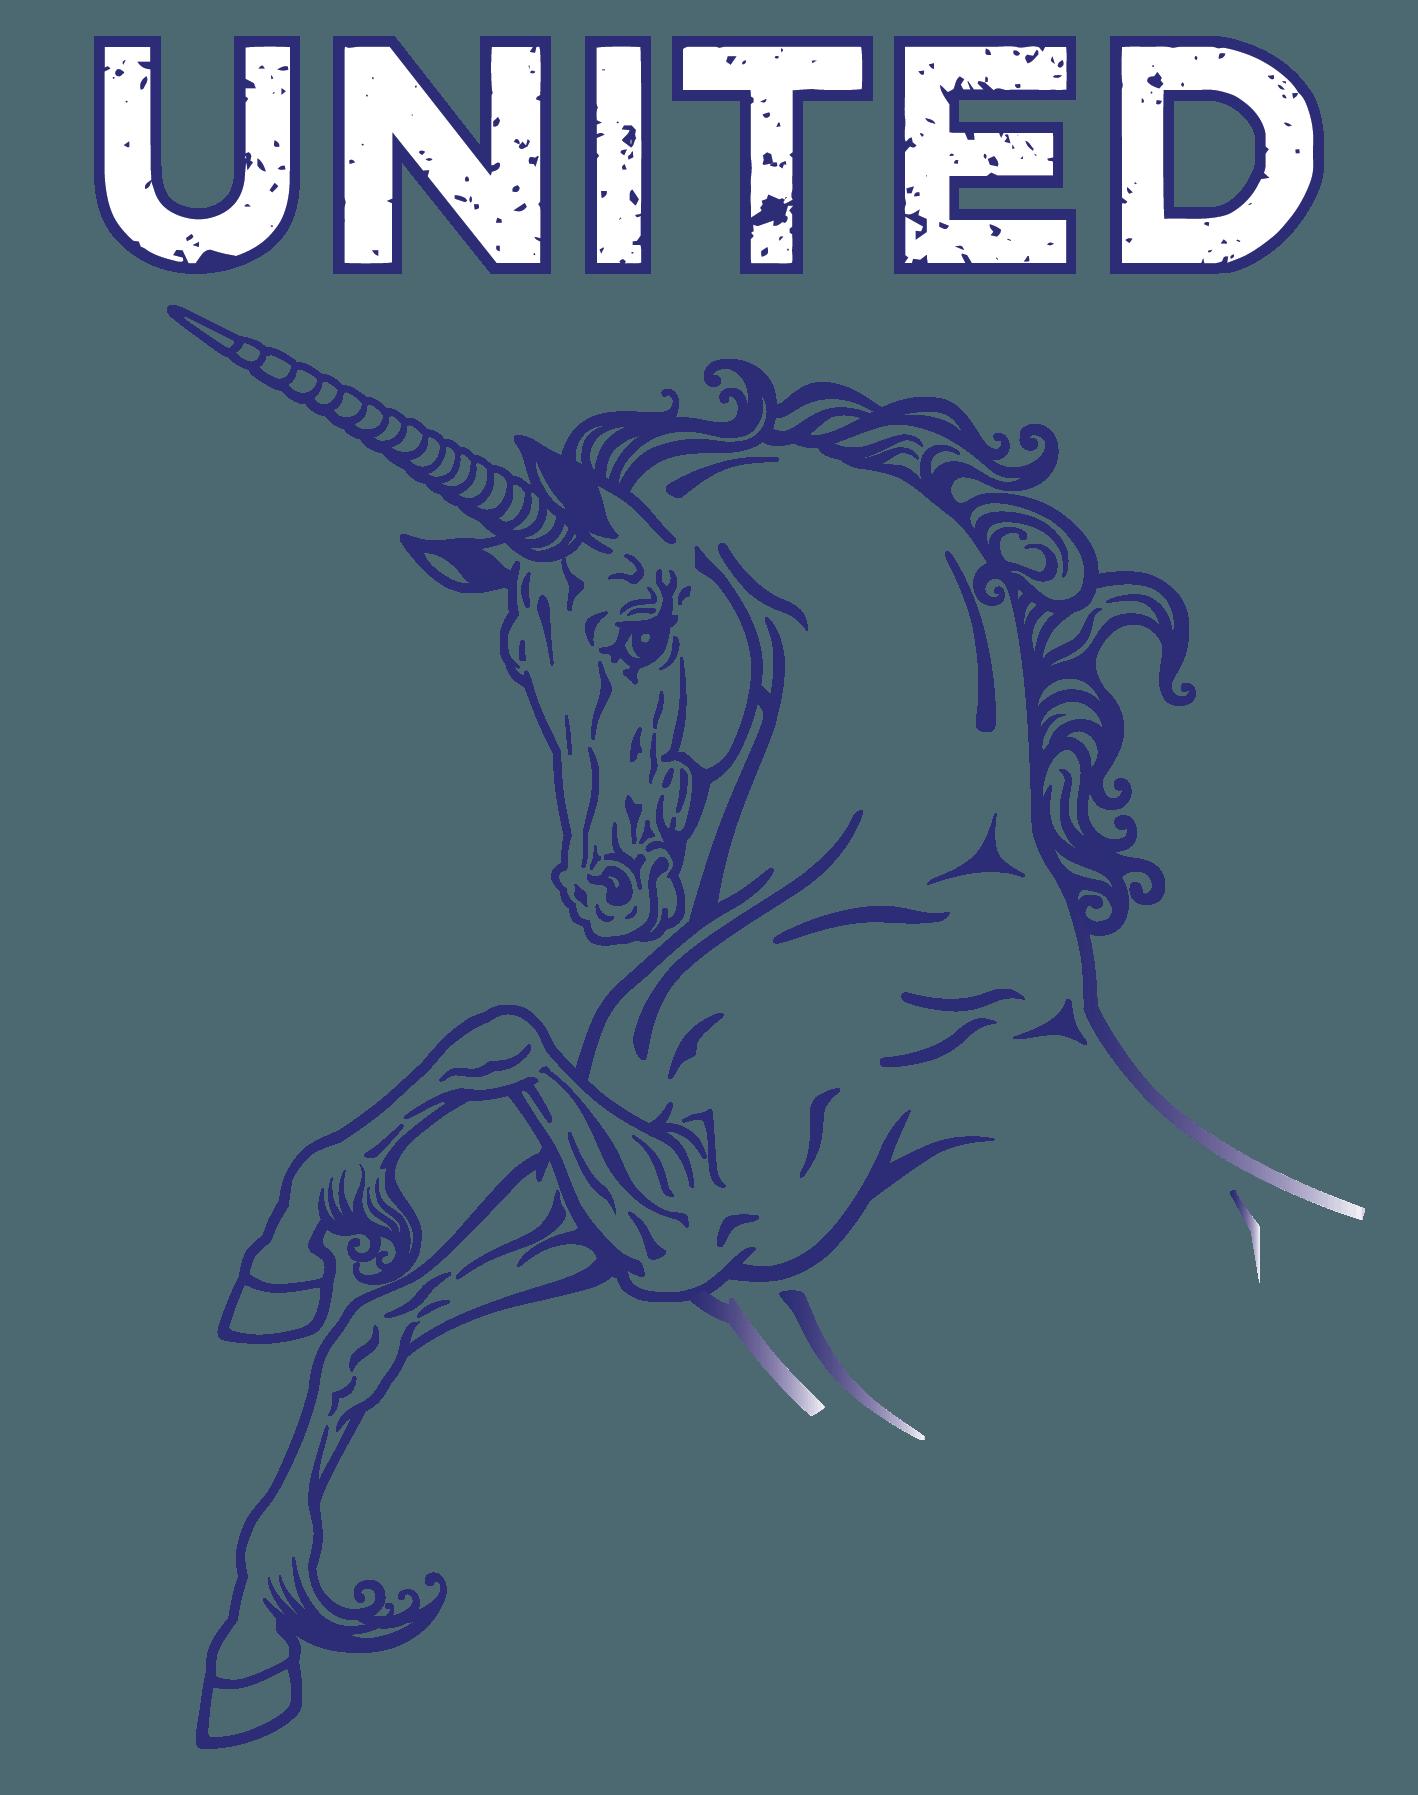 UnitedUnicorn.png